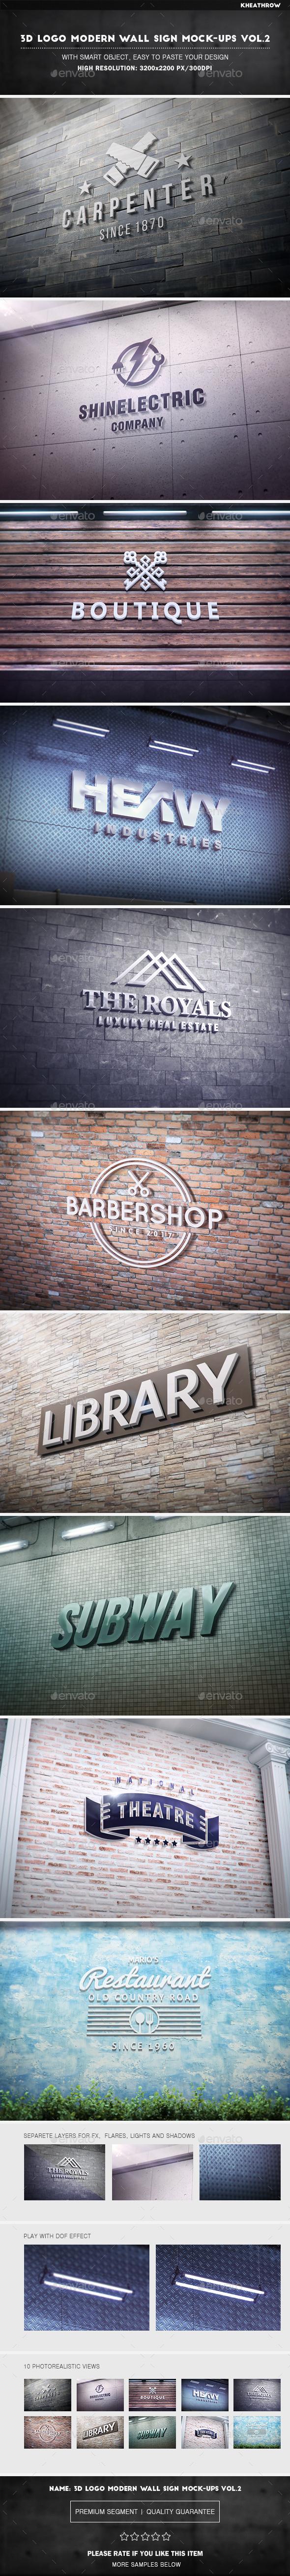 3D Logo Modern Wall Sign Mock-Ups Vol.2 - Logo Product Mock-Ups